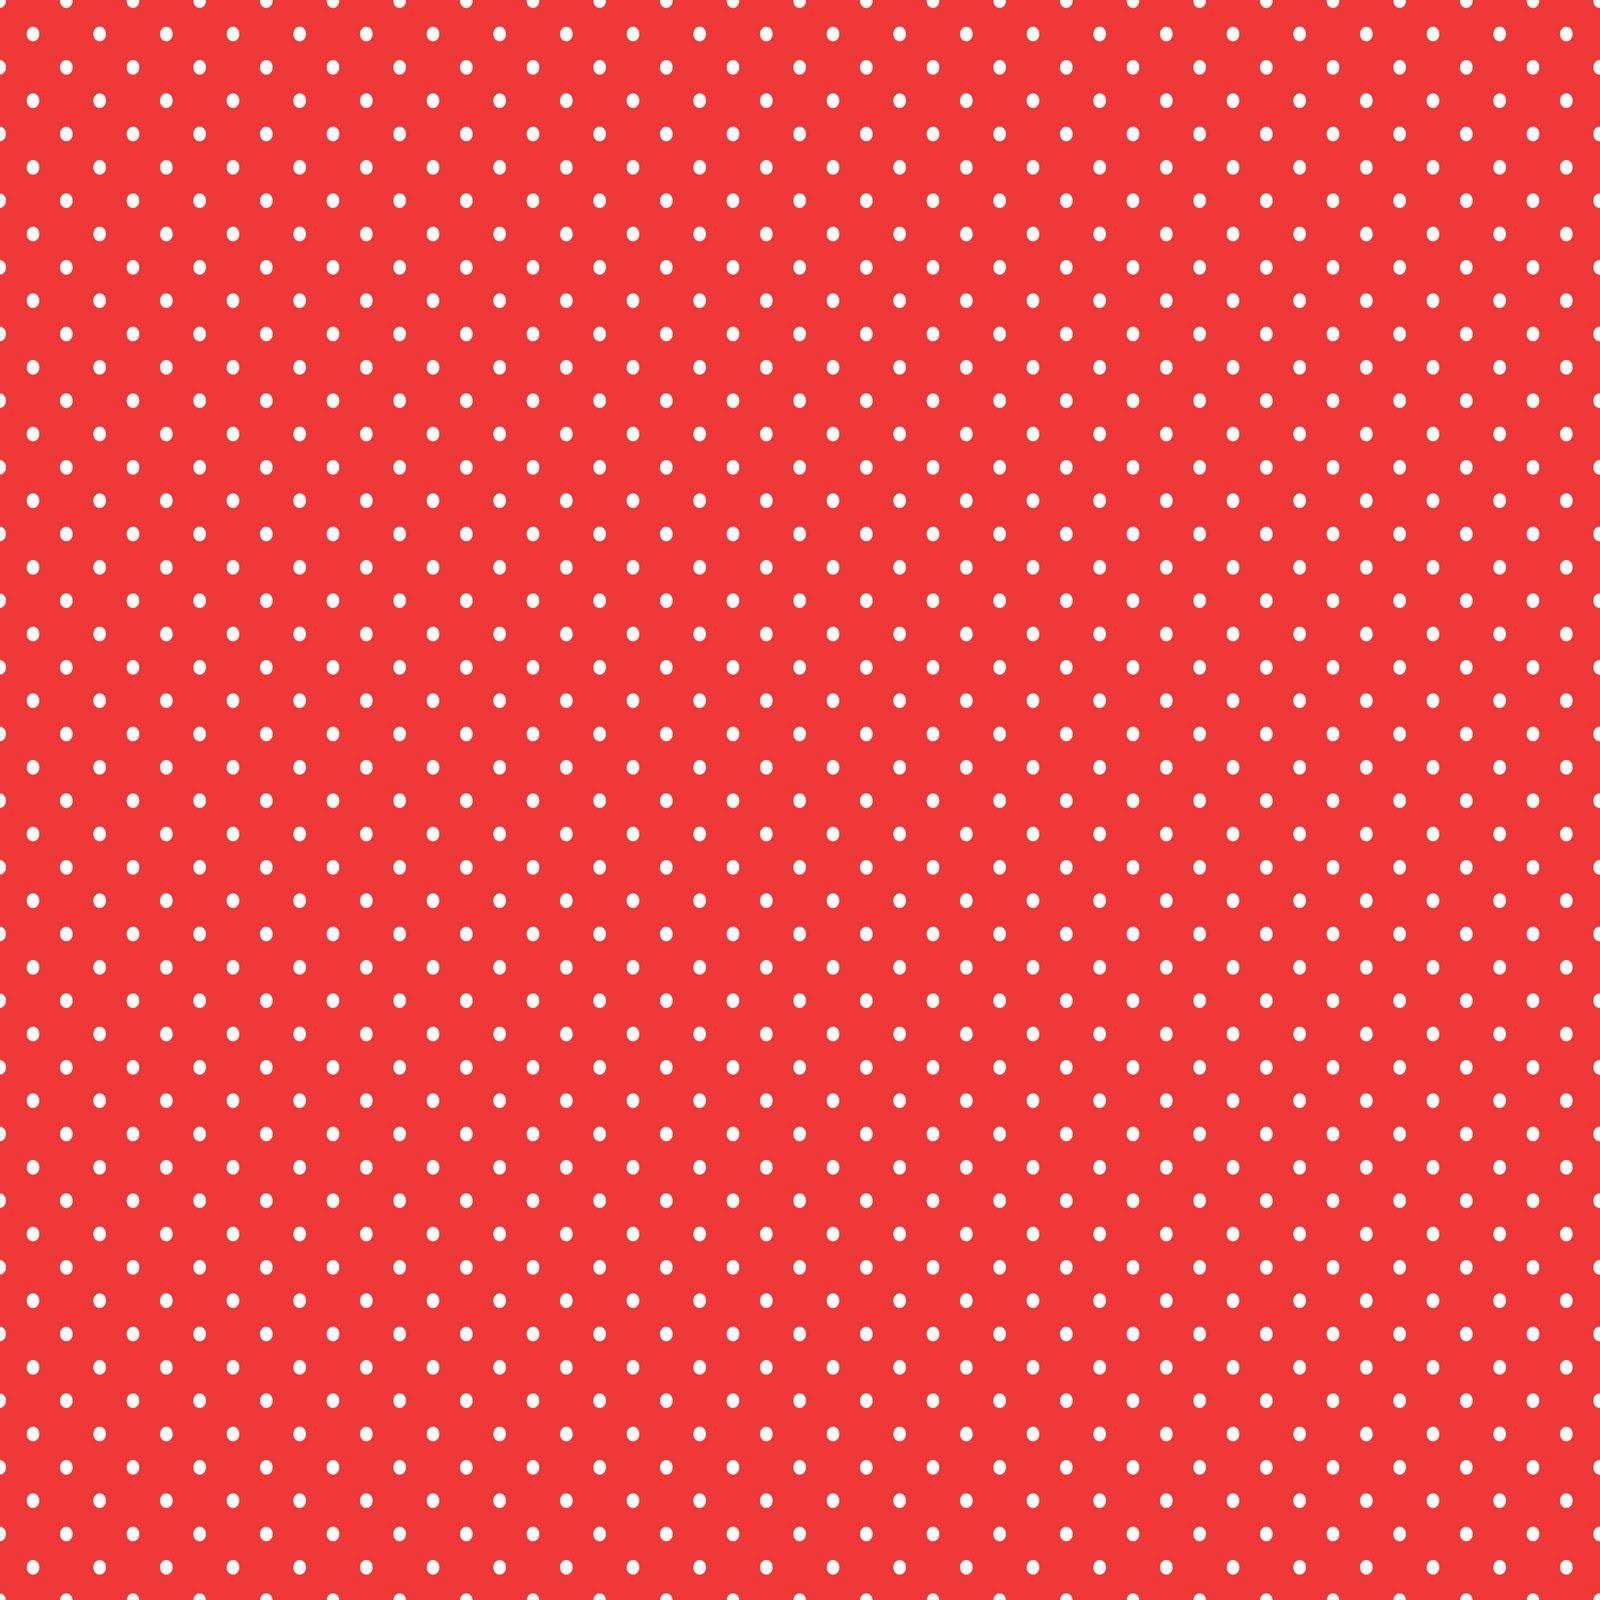 How to make scrapbook vintage -  Free Vintage Digital Stamps Free Digital Scrapbook Paper Red Polka